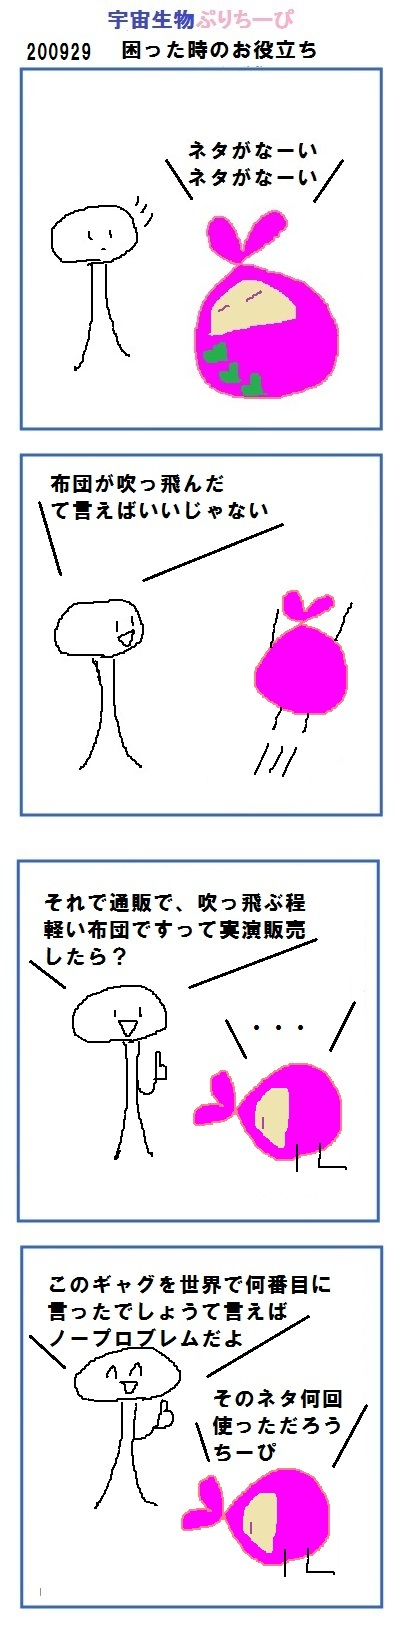 200929-pry.jpg